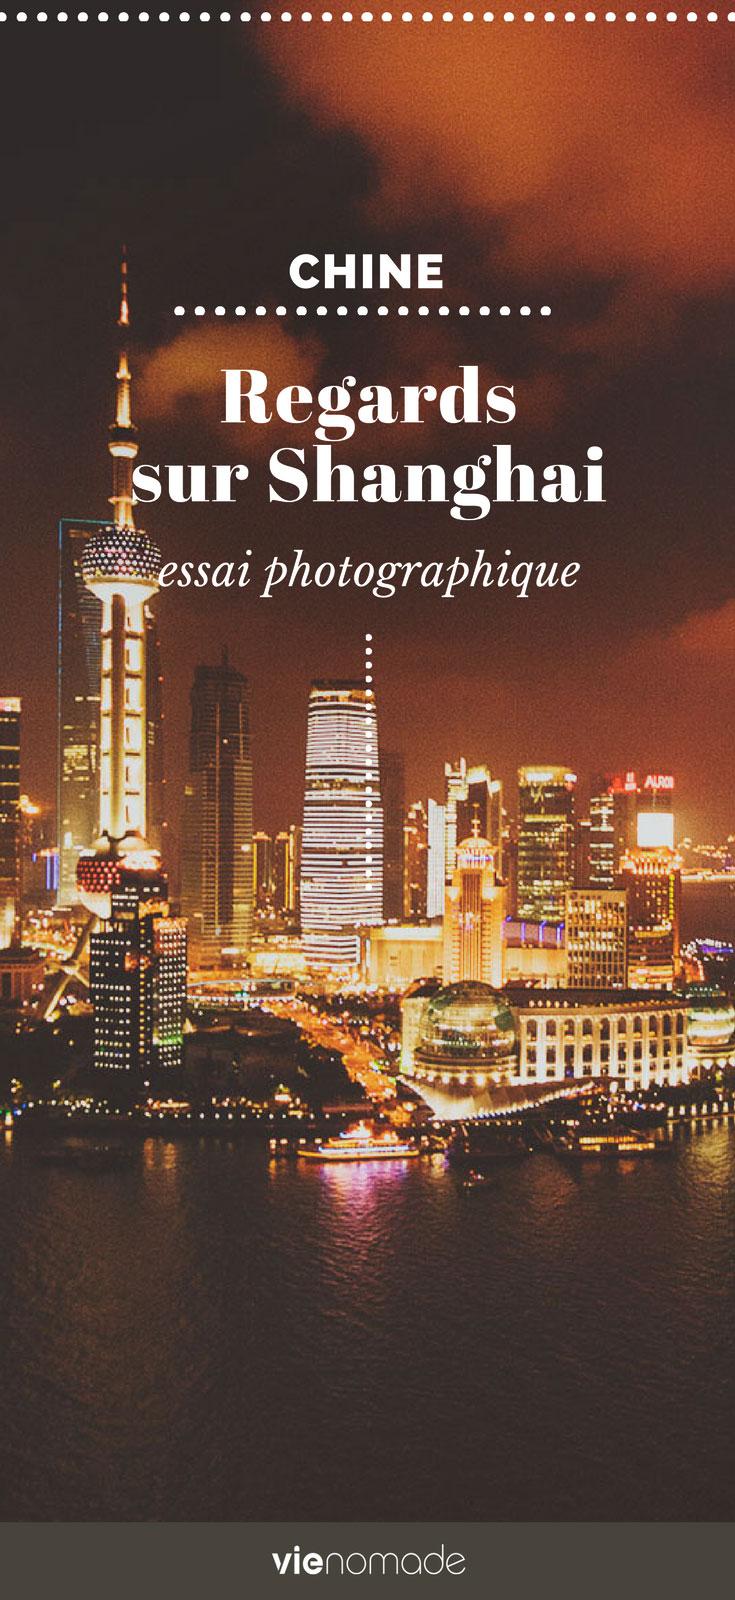 Photos de Shanghai, Chine